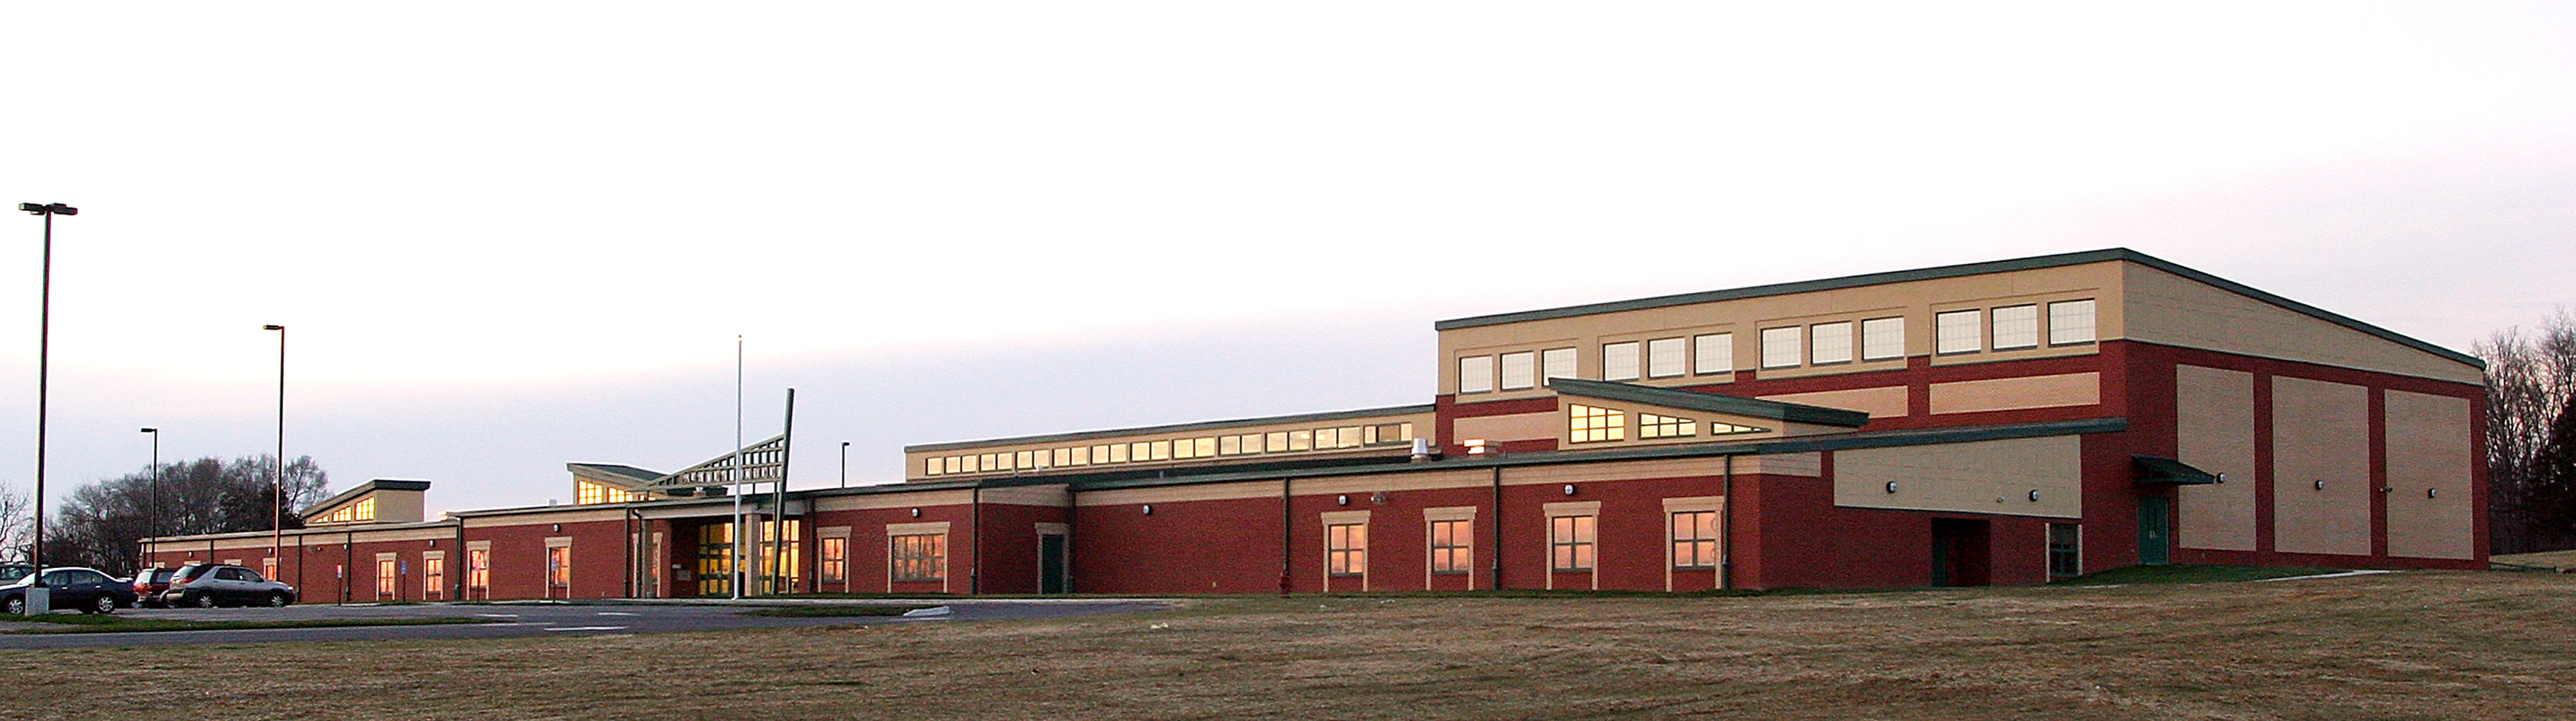 Boston Elementary School